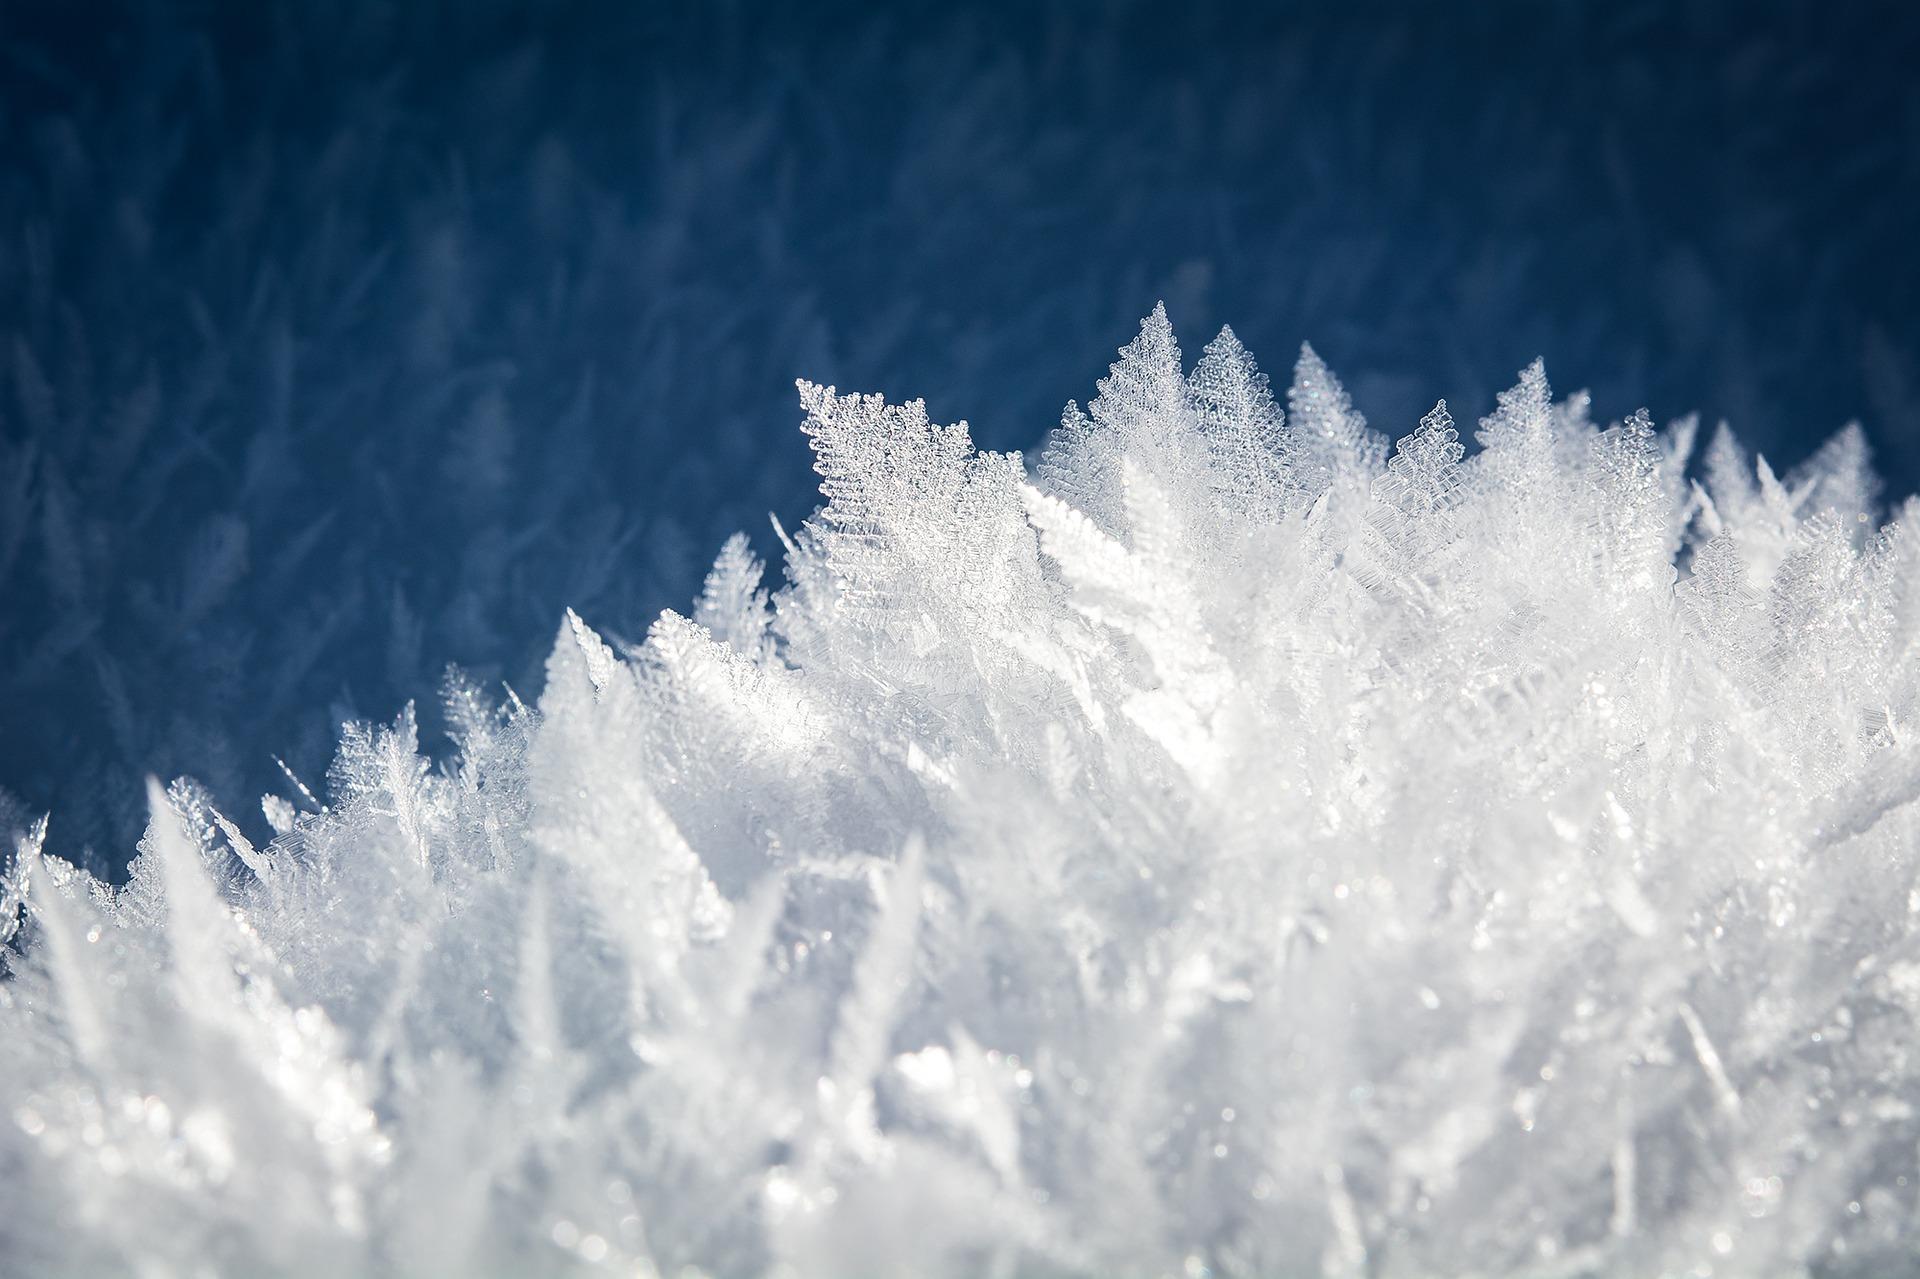 ice-1997289_1920_1548691868884.jpg